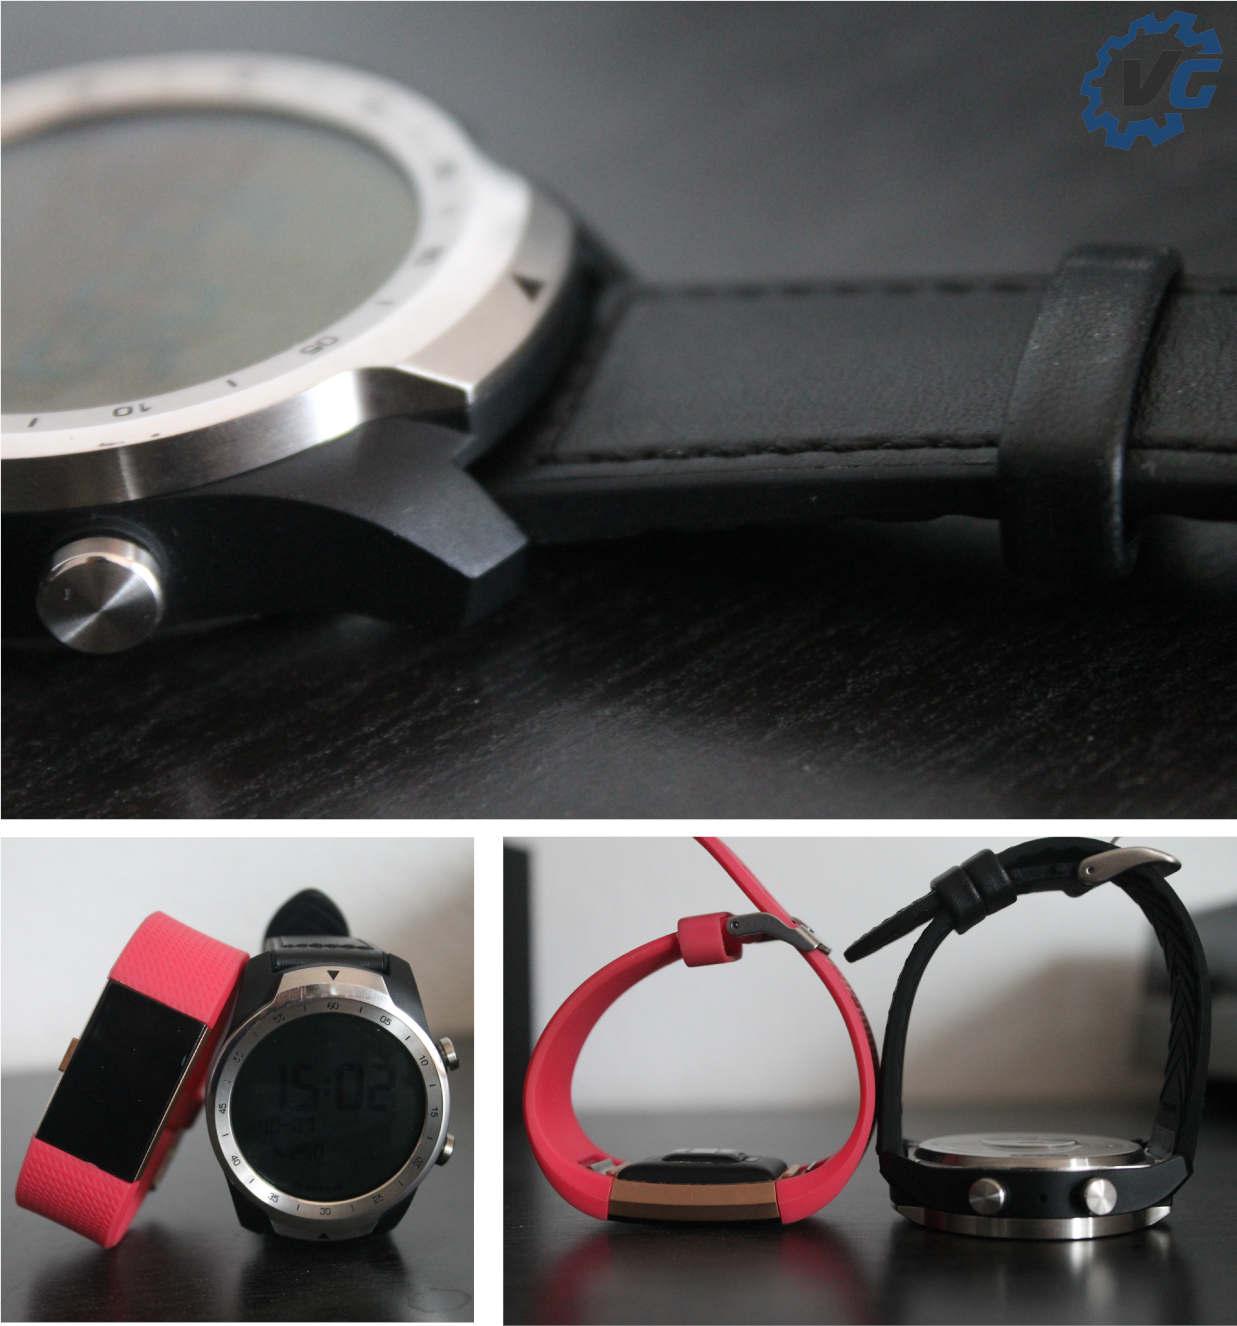 ticwatchpro mobvoi montre